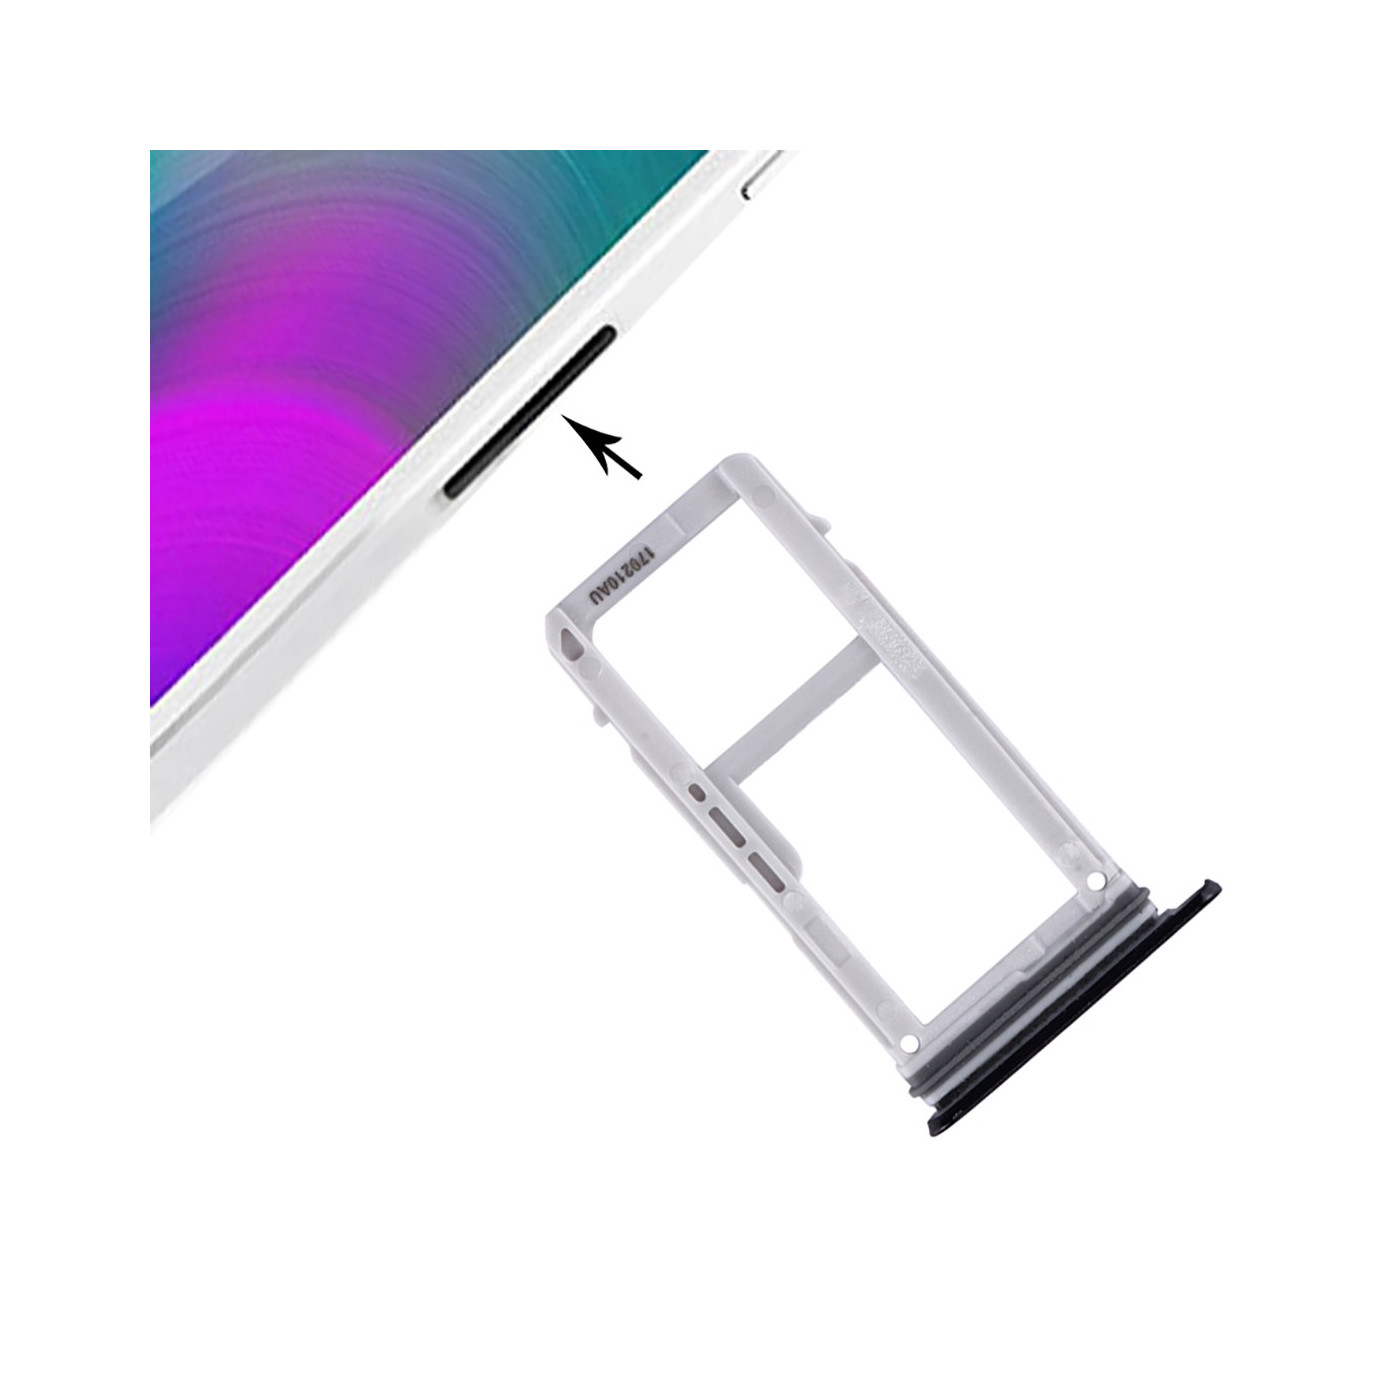 The SIM DOOR SD CARD Samsung Galaxy A3 2017 A320 BLACK SLOT SLIDE